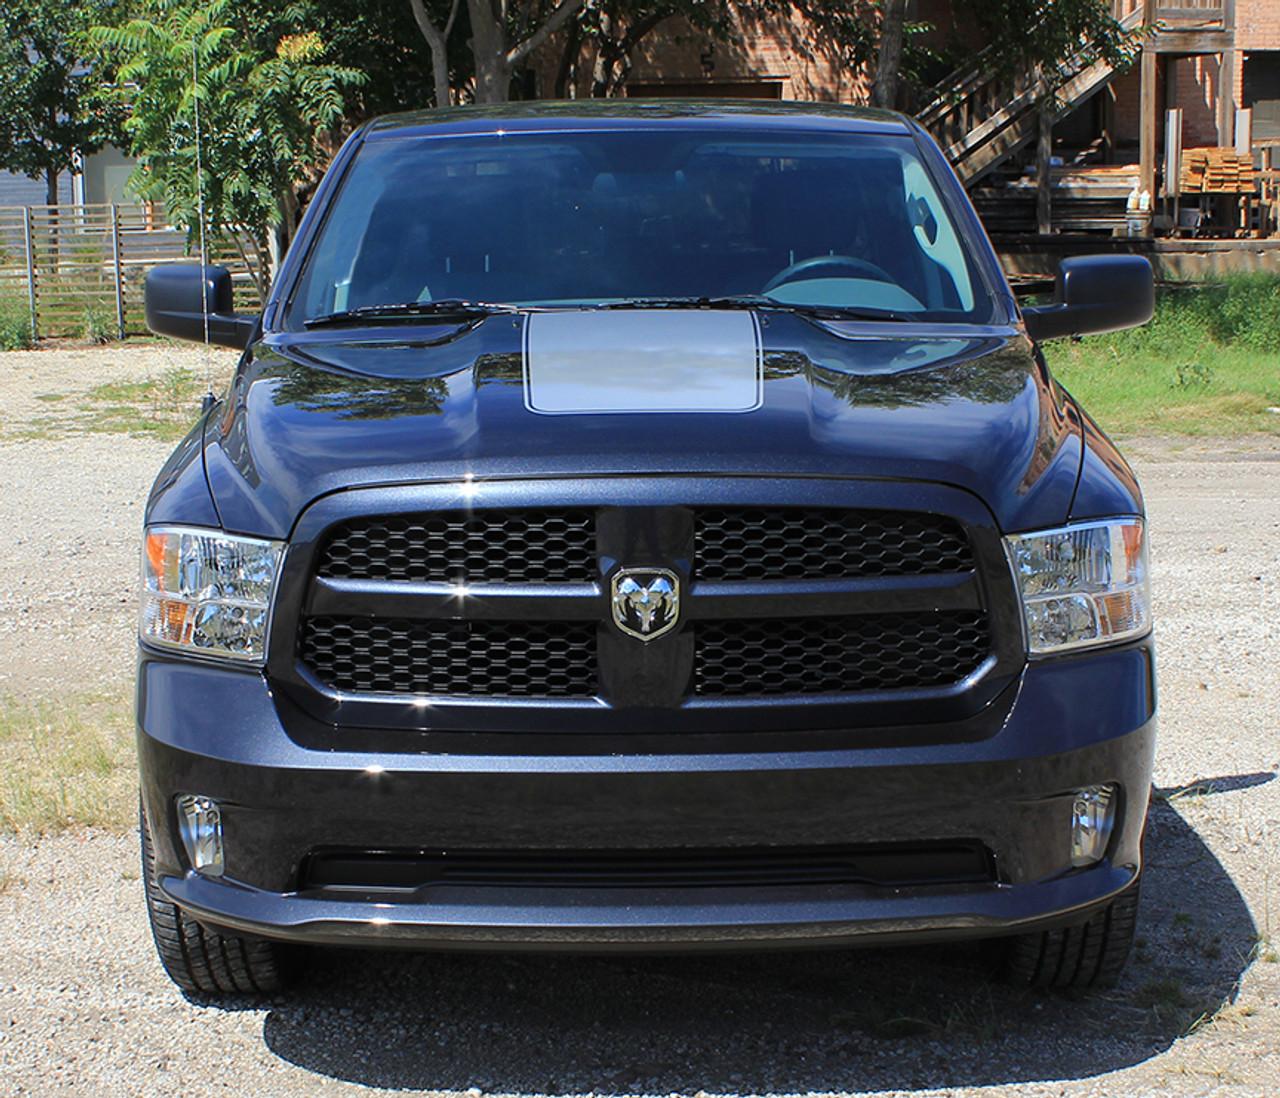 Dodge 2016 Trucks: Stripes For Dodge Ram Truck Graphics 2009